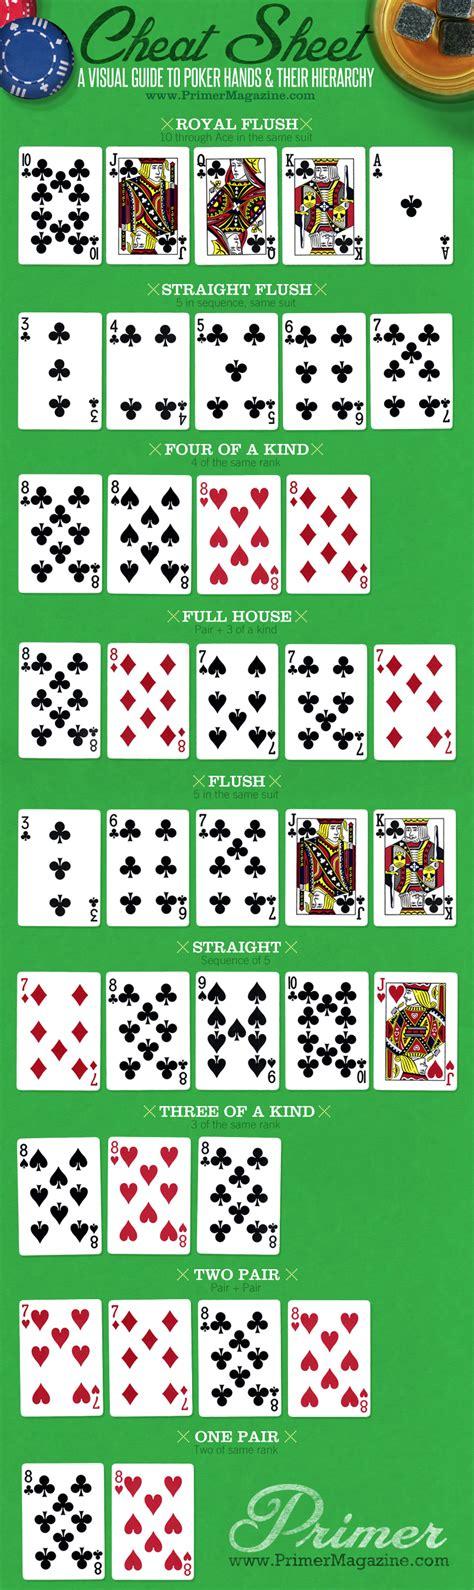 visual guide  poker hands descriptions